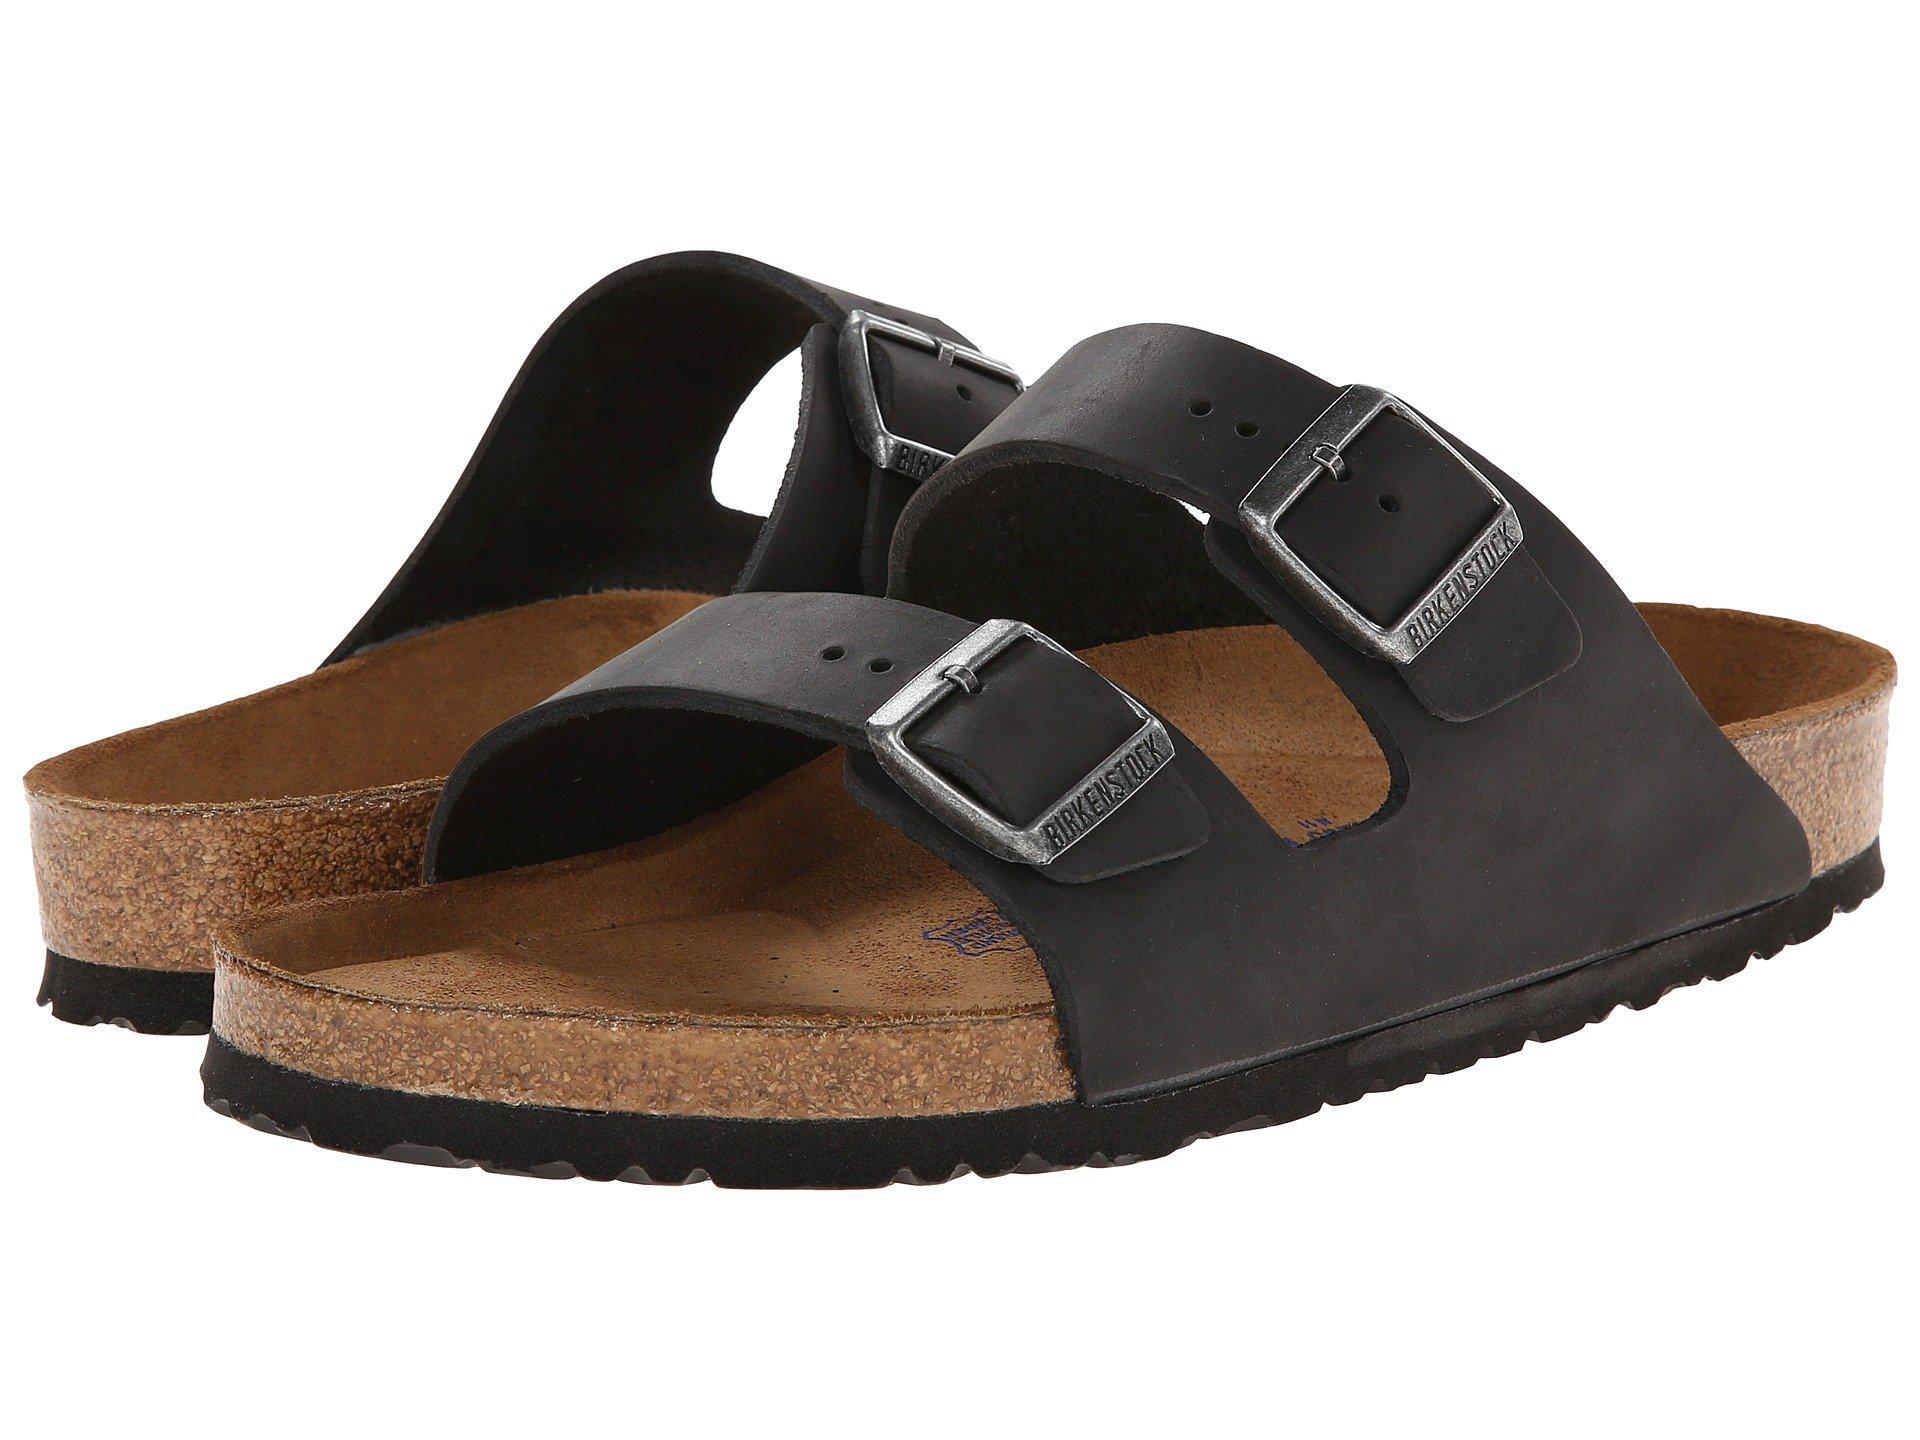 a23ef6f6fe3a Birkenstock - Black Arizona Soft Footbed - Leather (unisex) (habana) Sandals  -. View fullscreen